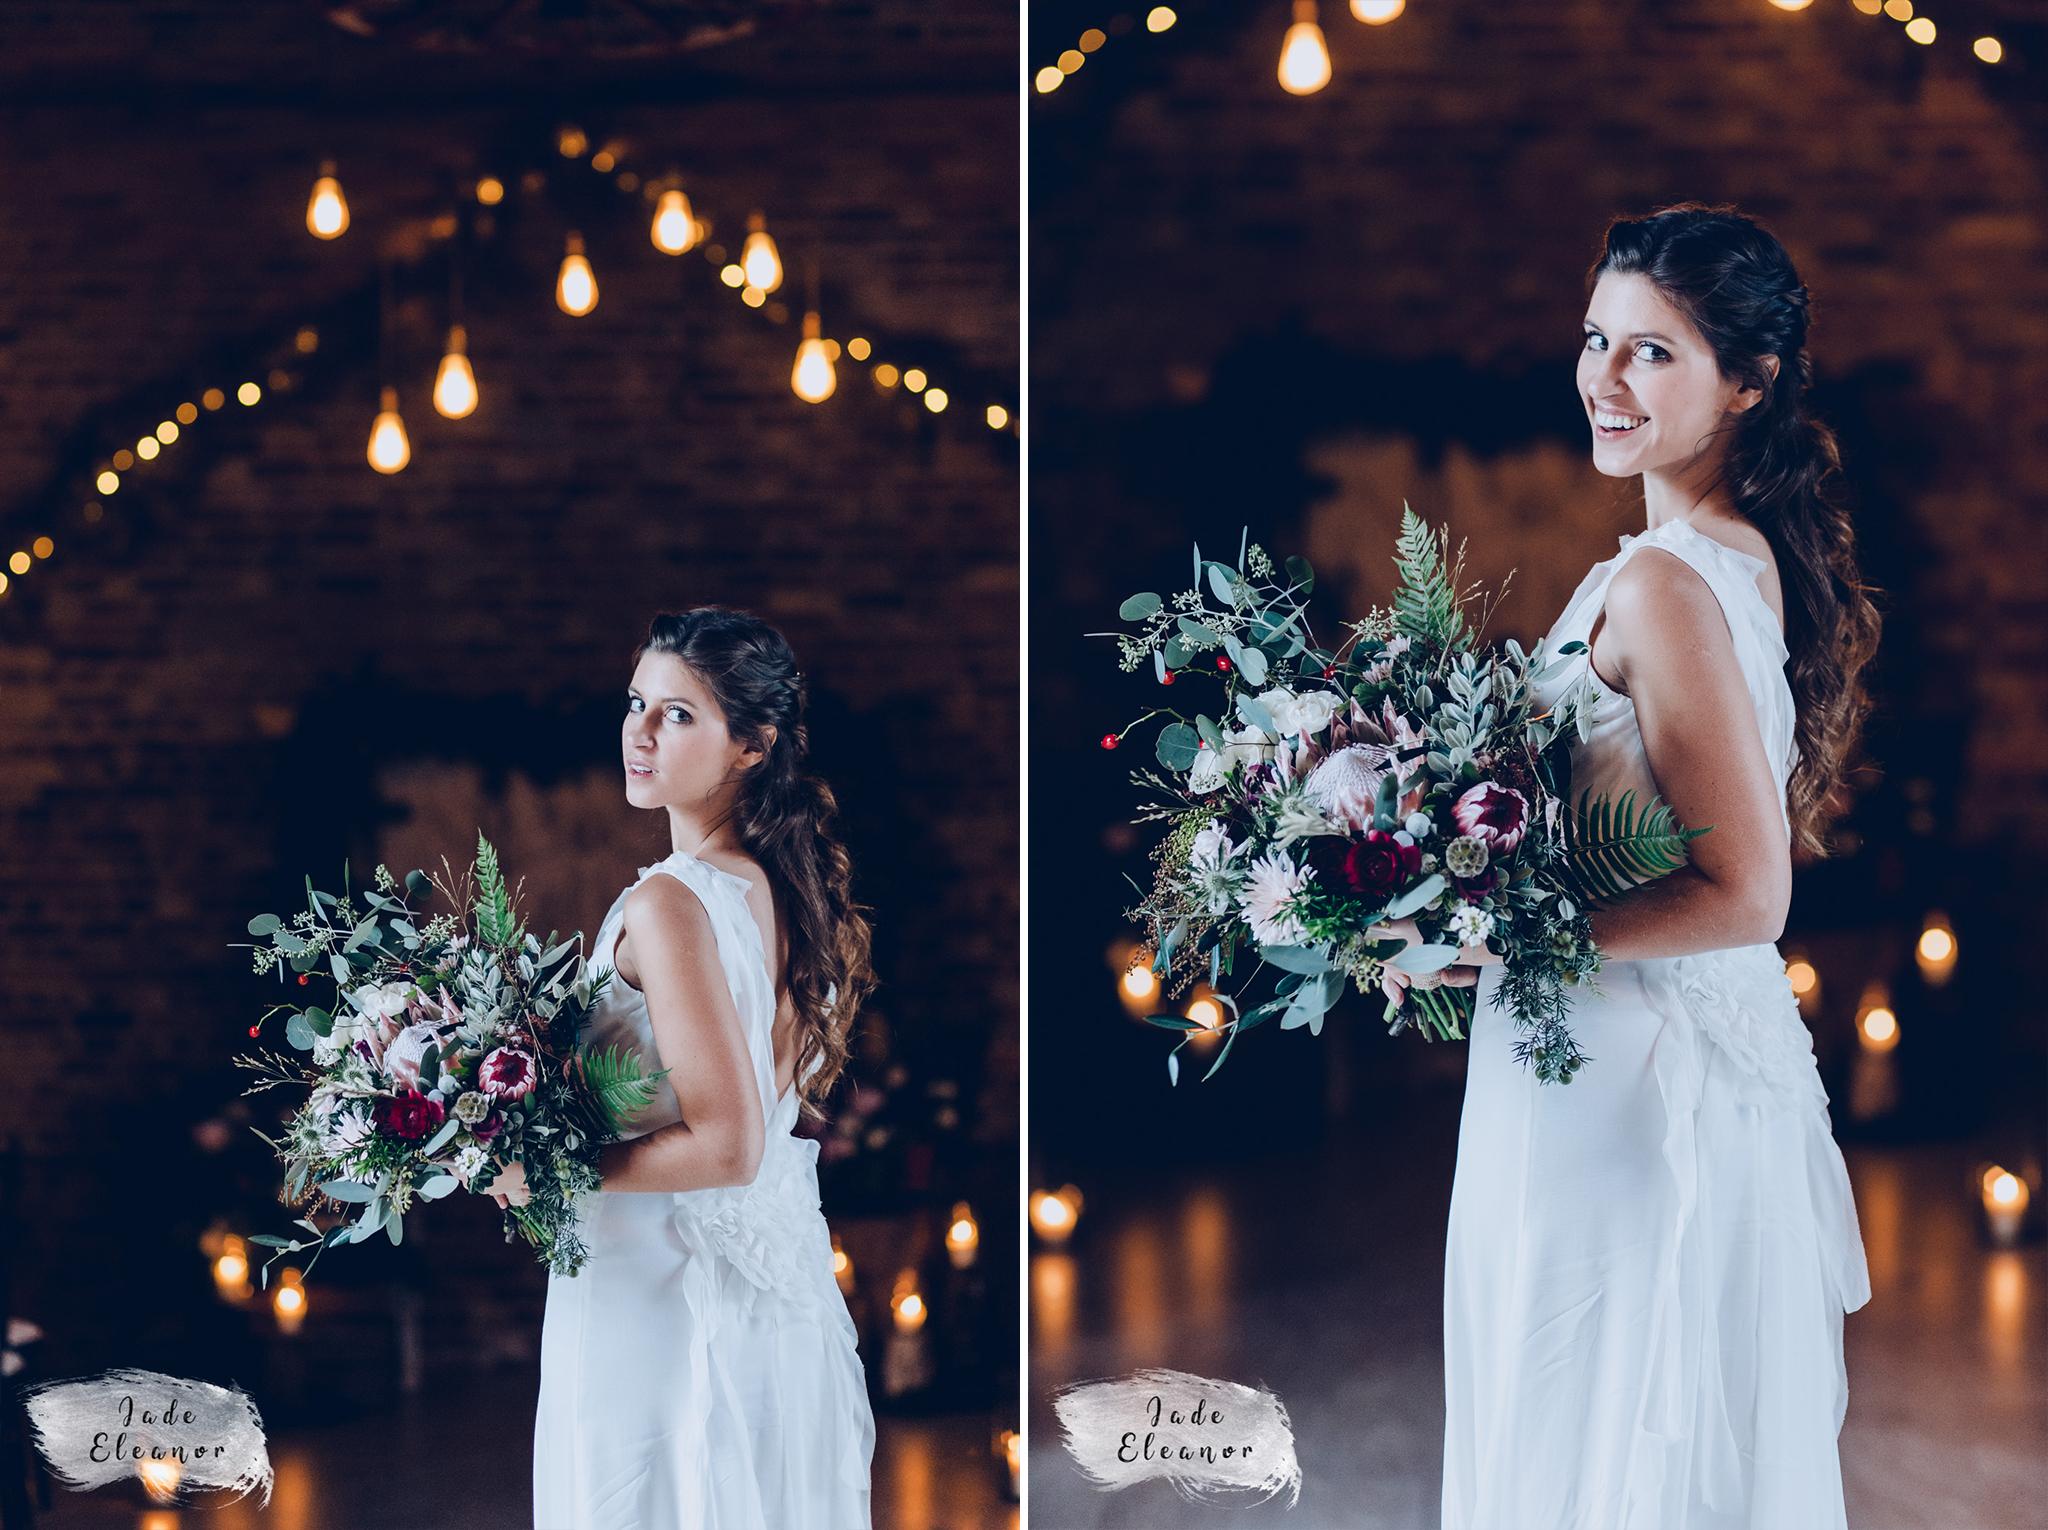 Bysshe Court Barn Wedding Jade Eleanor Photography-6&9.jpg